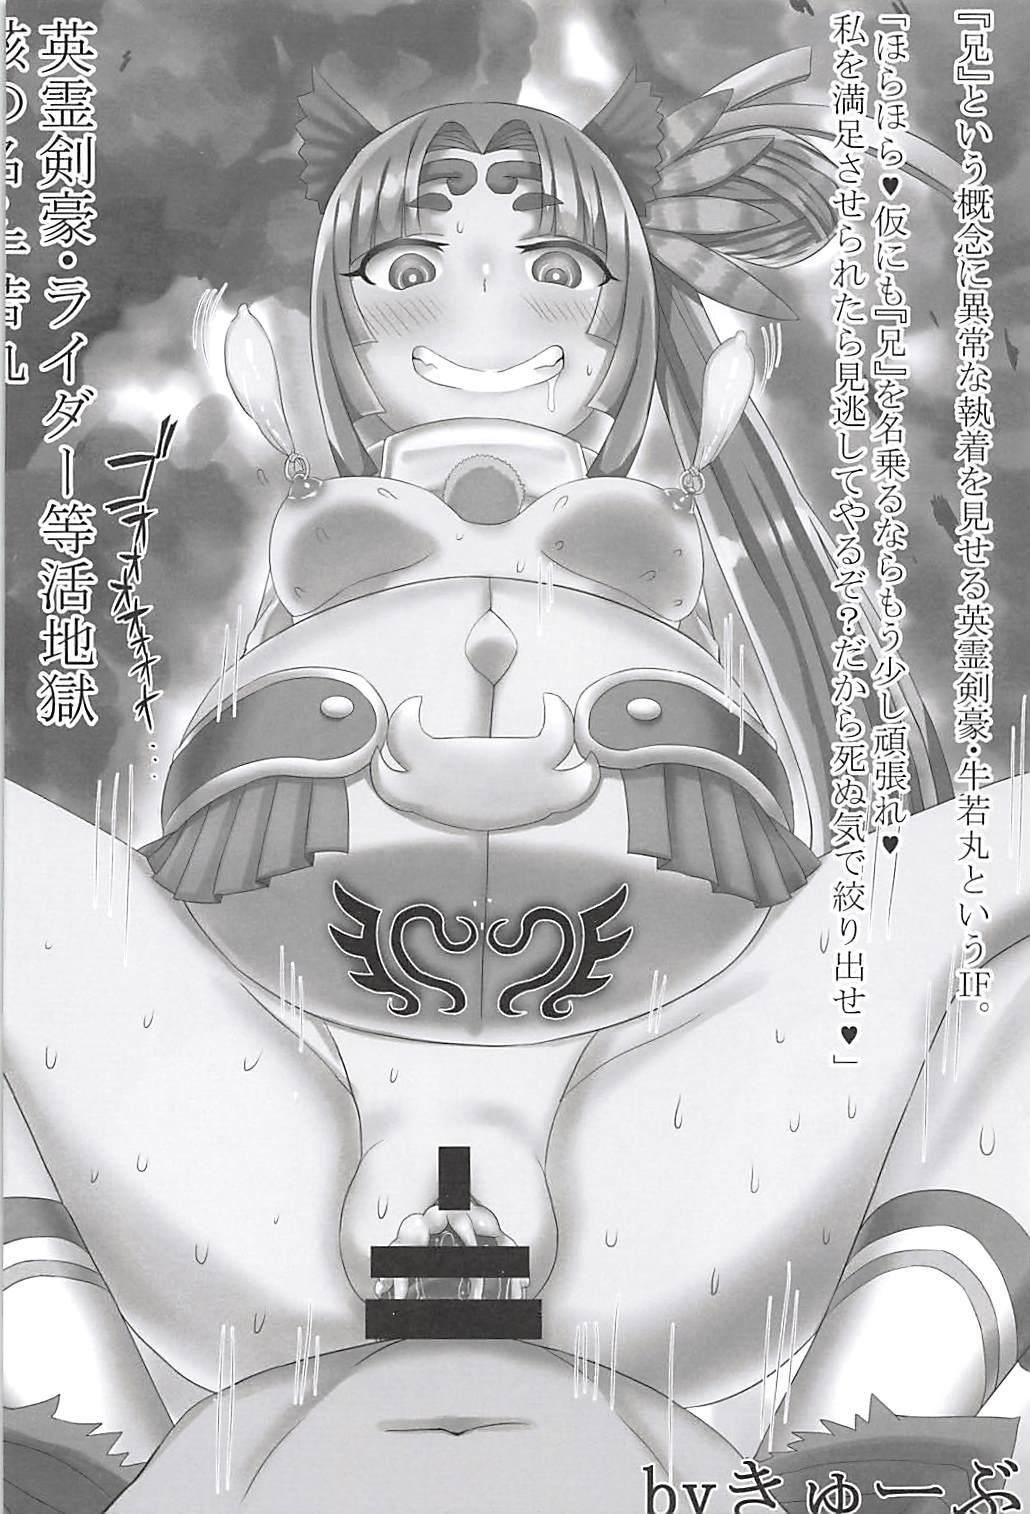 FGO Ashu Tokuiten Goudou - Ashu Reiyoku Danshou 25